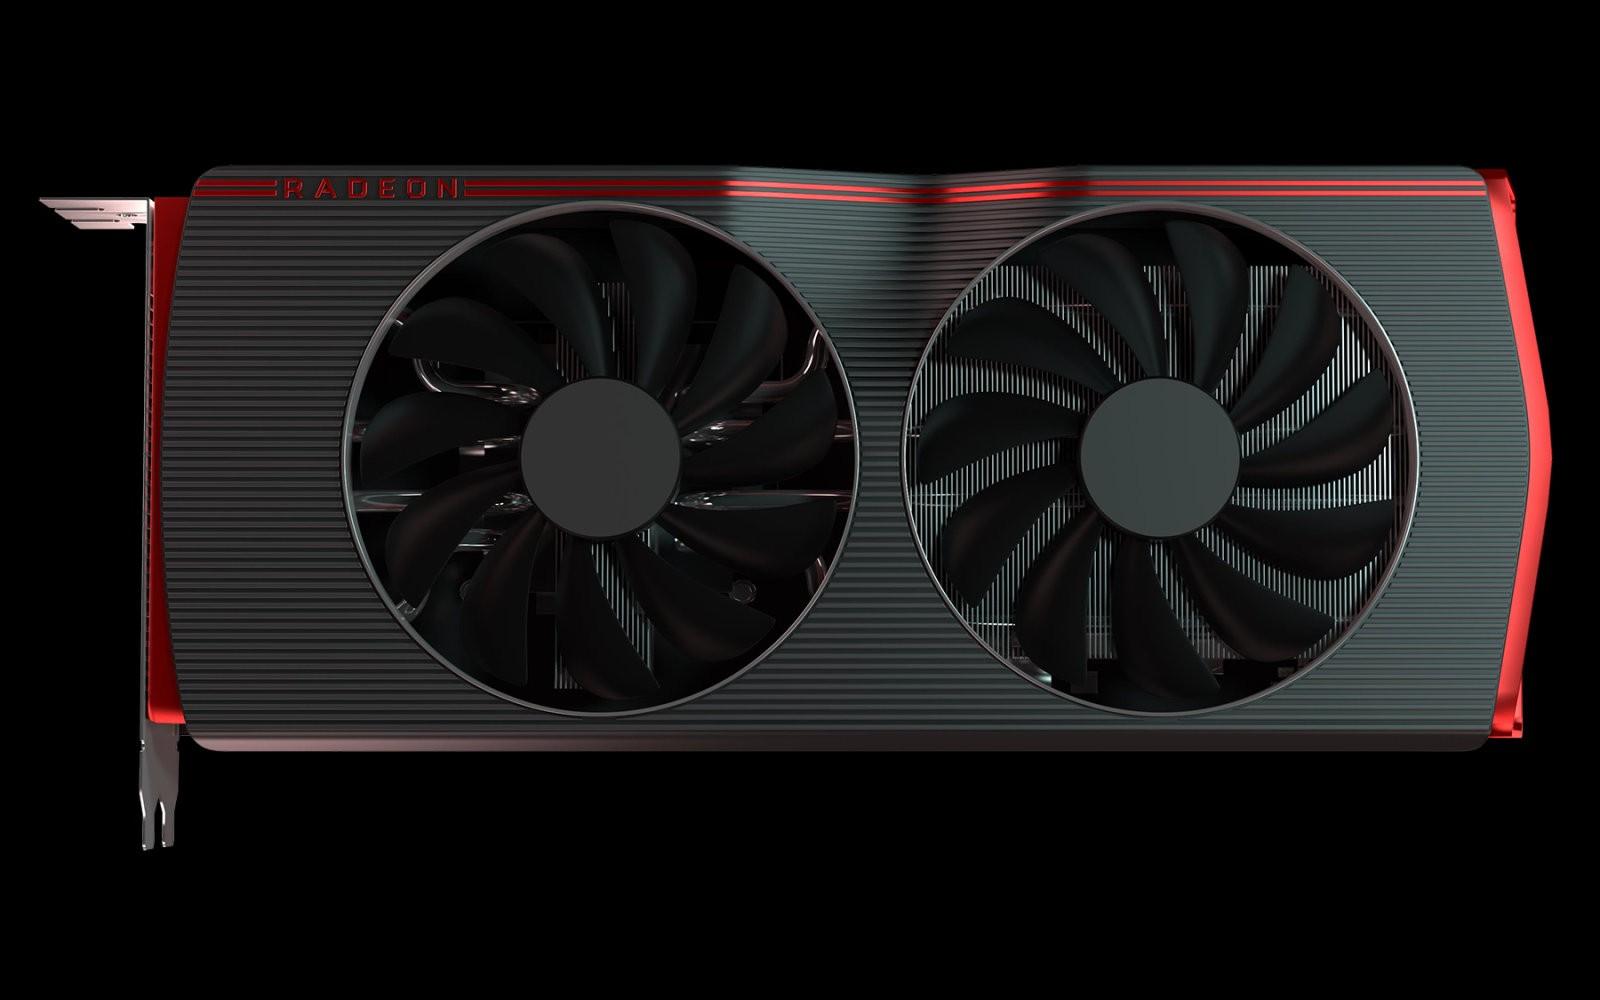 AMD Announces New Radeon 5600 XT Graphics Card